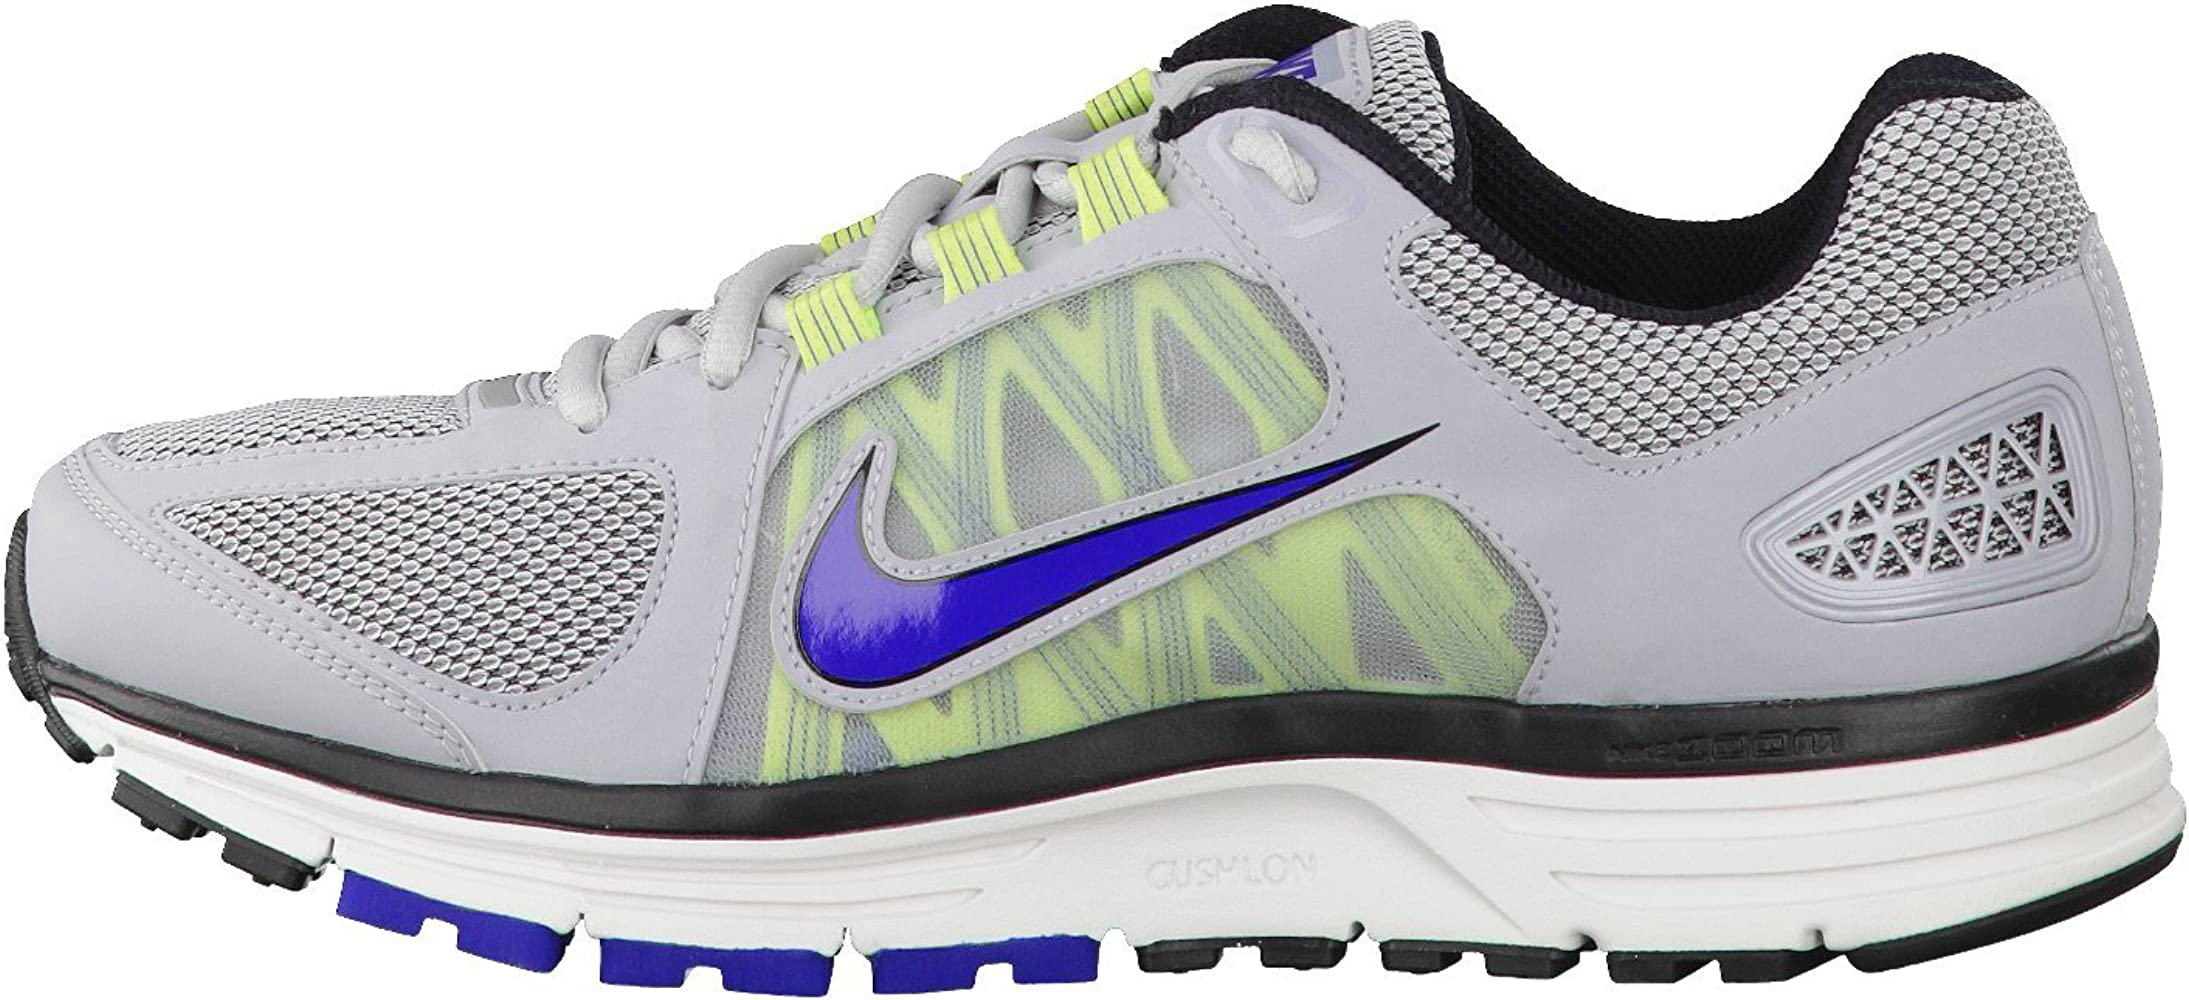 Nike - Modelo : 511488-040 Zoom Vomero+ 7 - Zapatilla de Running ...